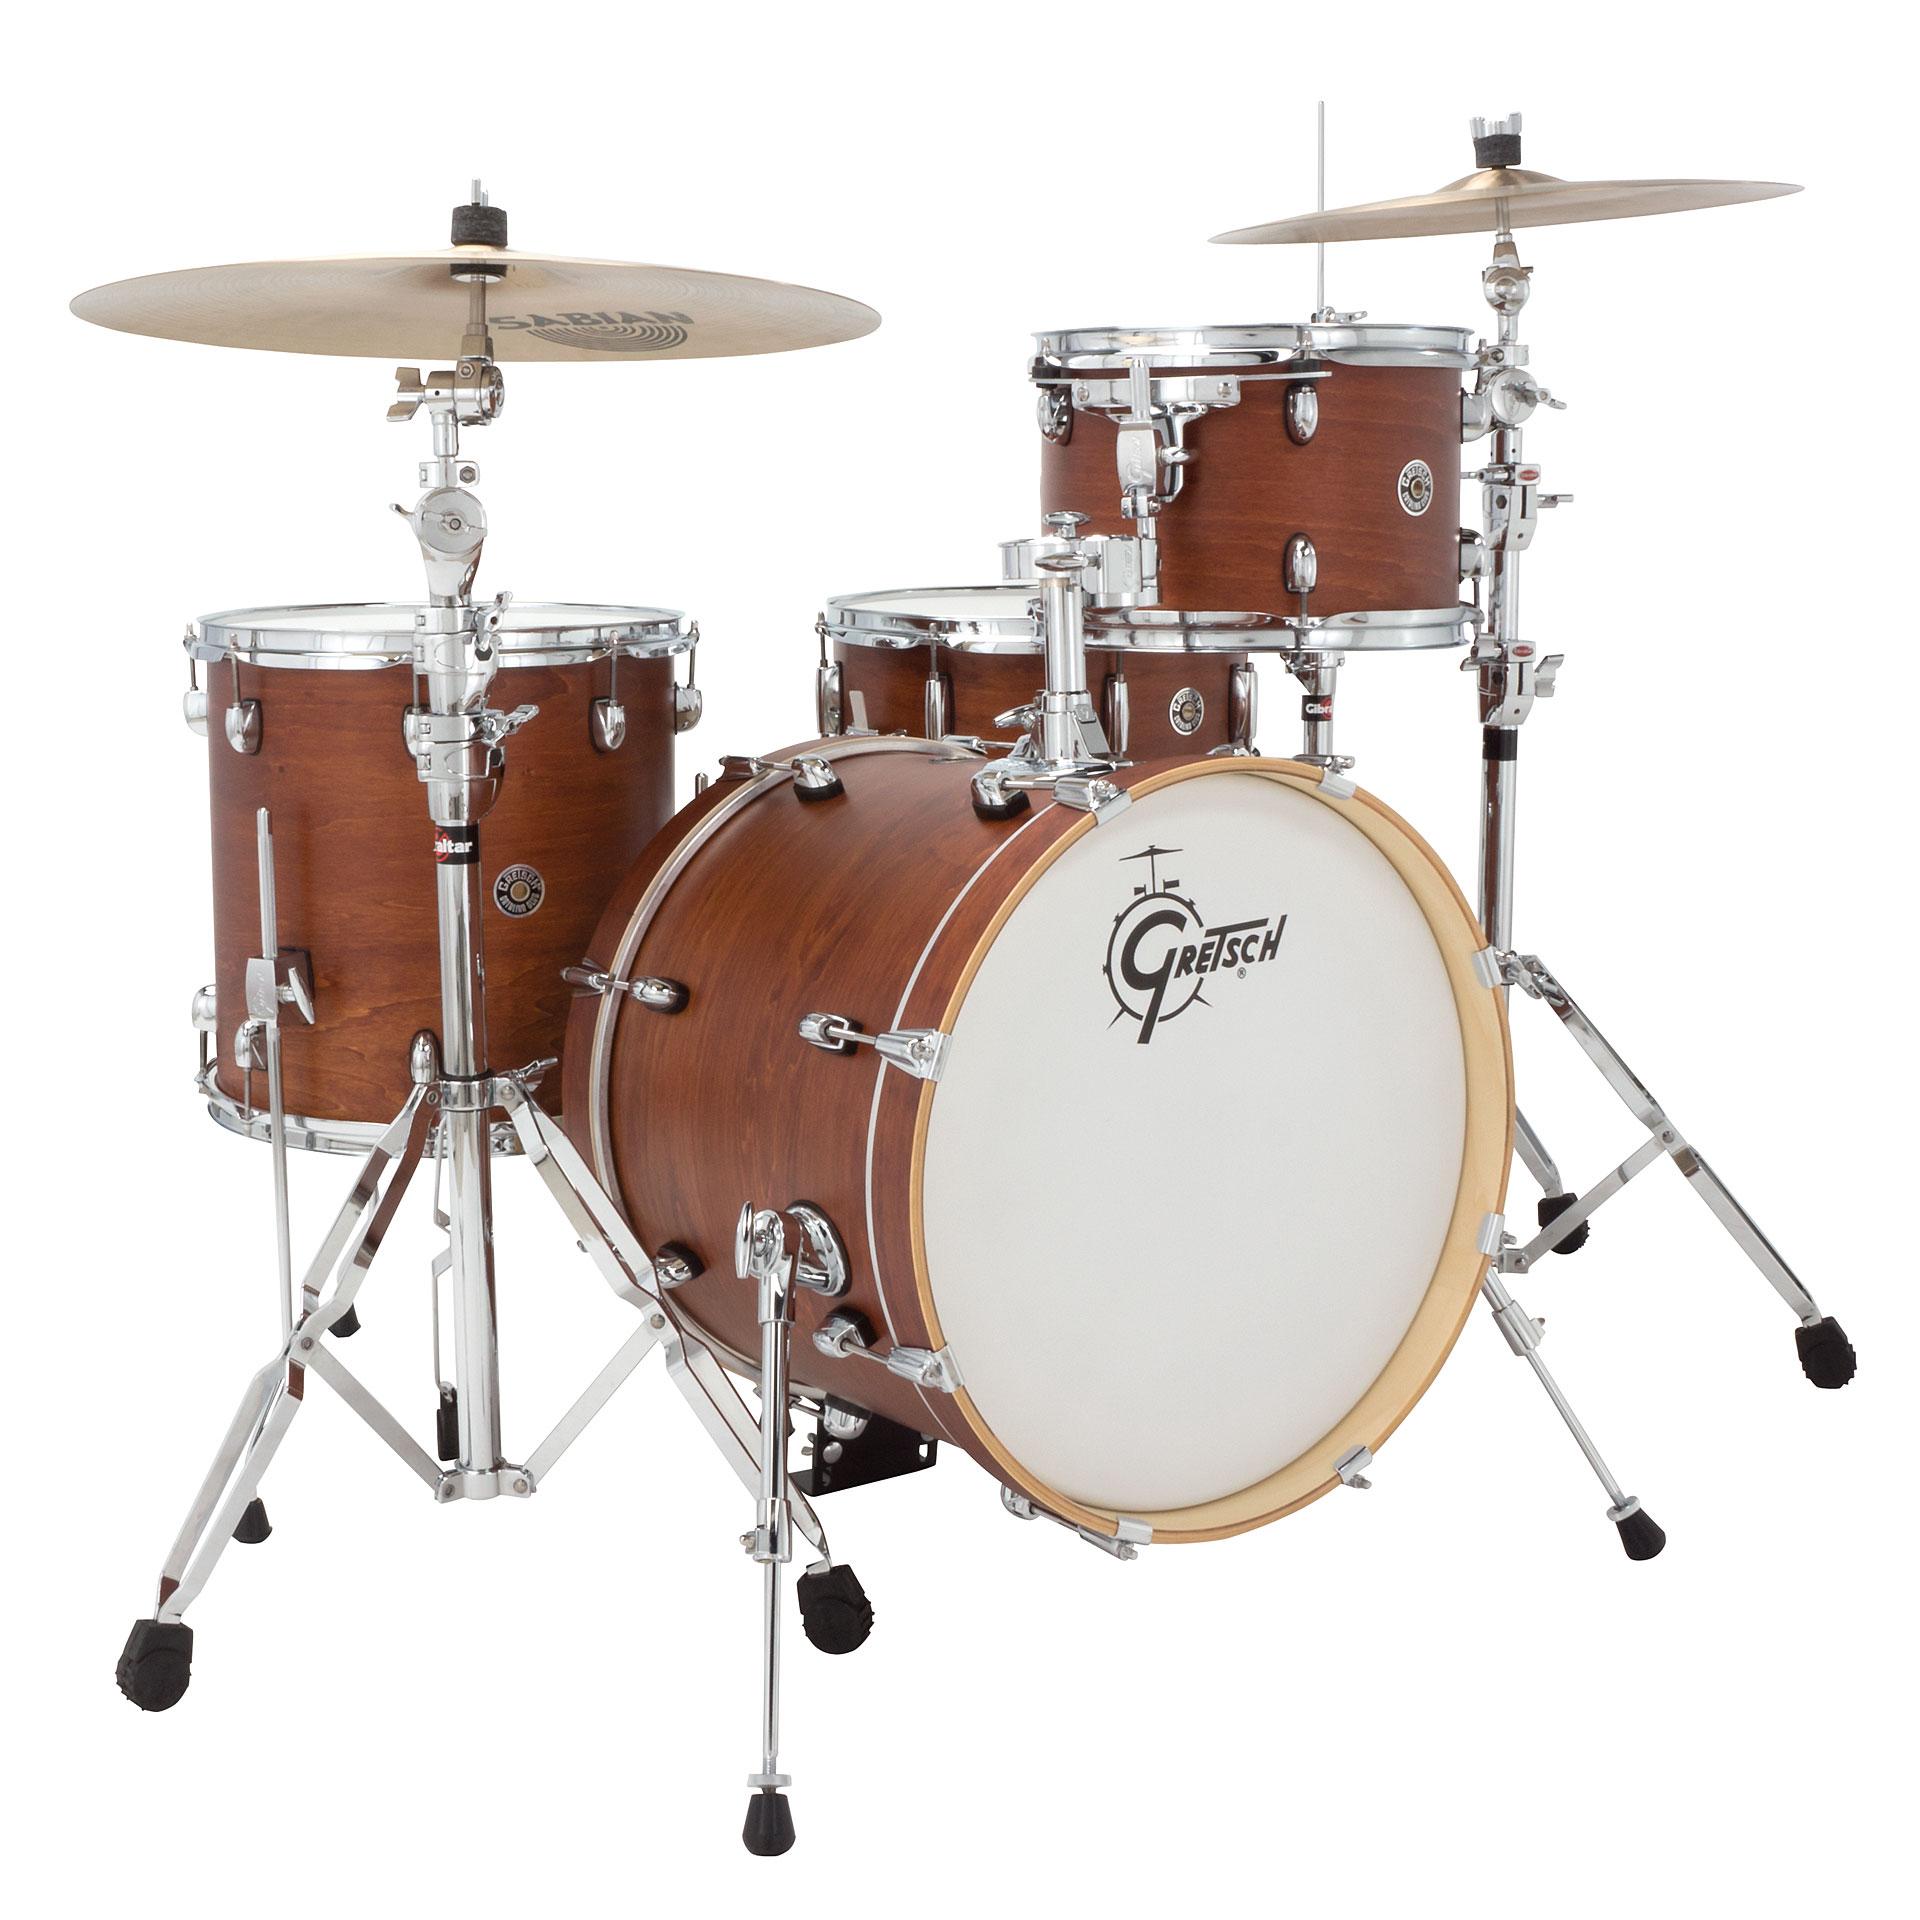 2265d1689948 Drum Kit Gretsch Drums Catalina Club 18 Satin Walnut Glaze Drumset ...